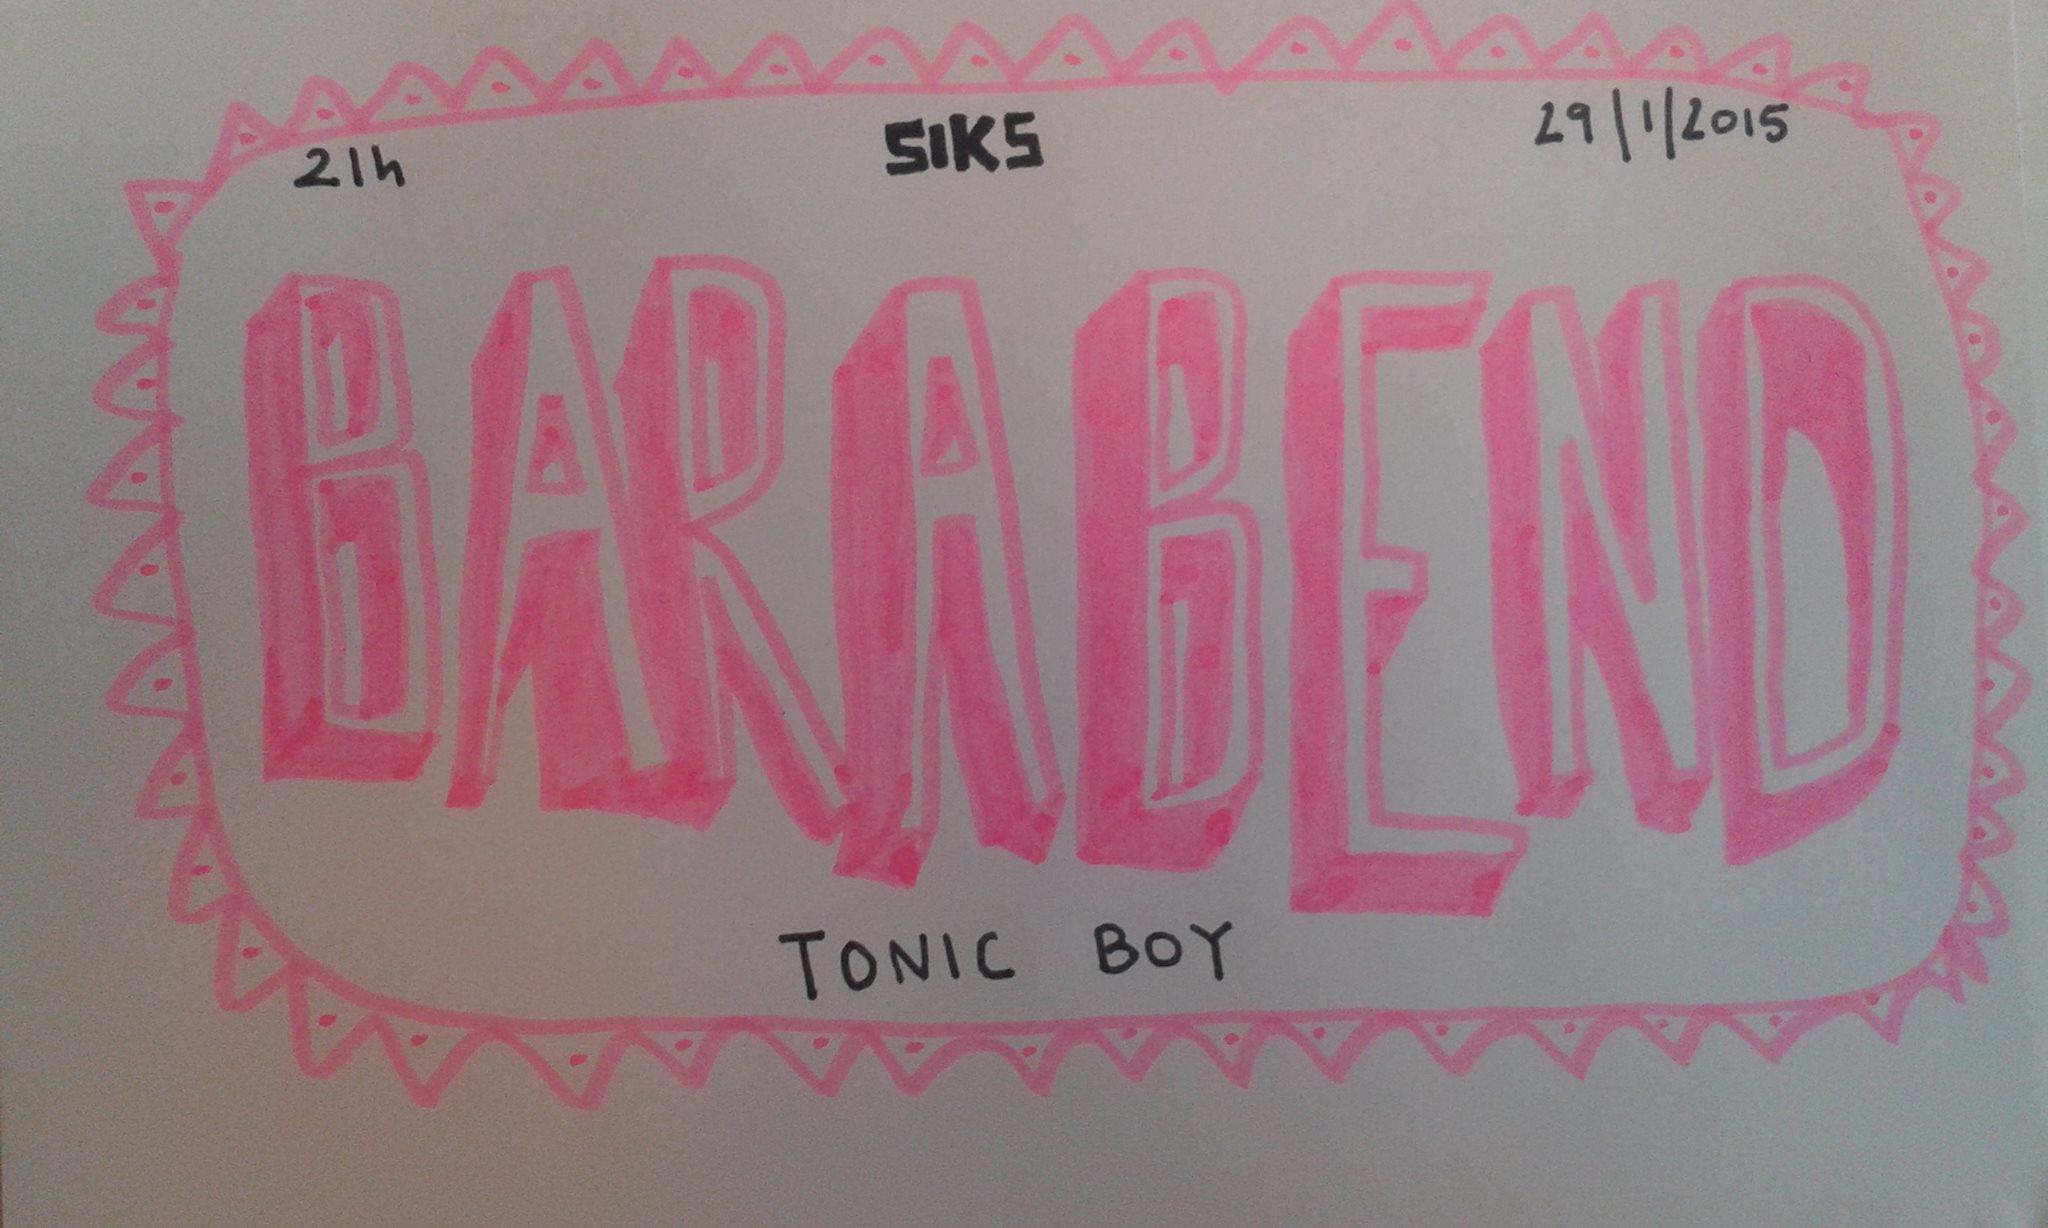 Barabend TonicBoy